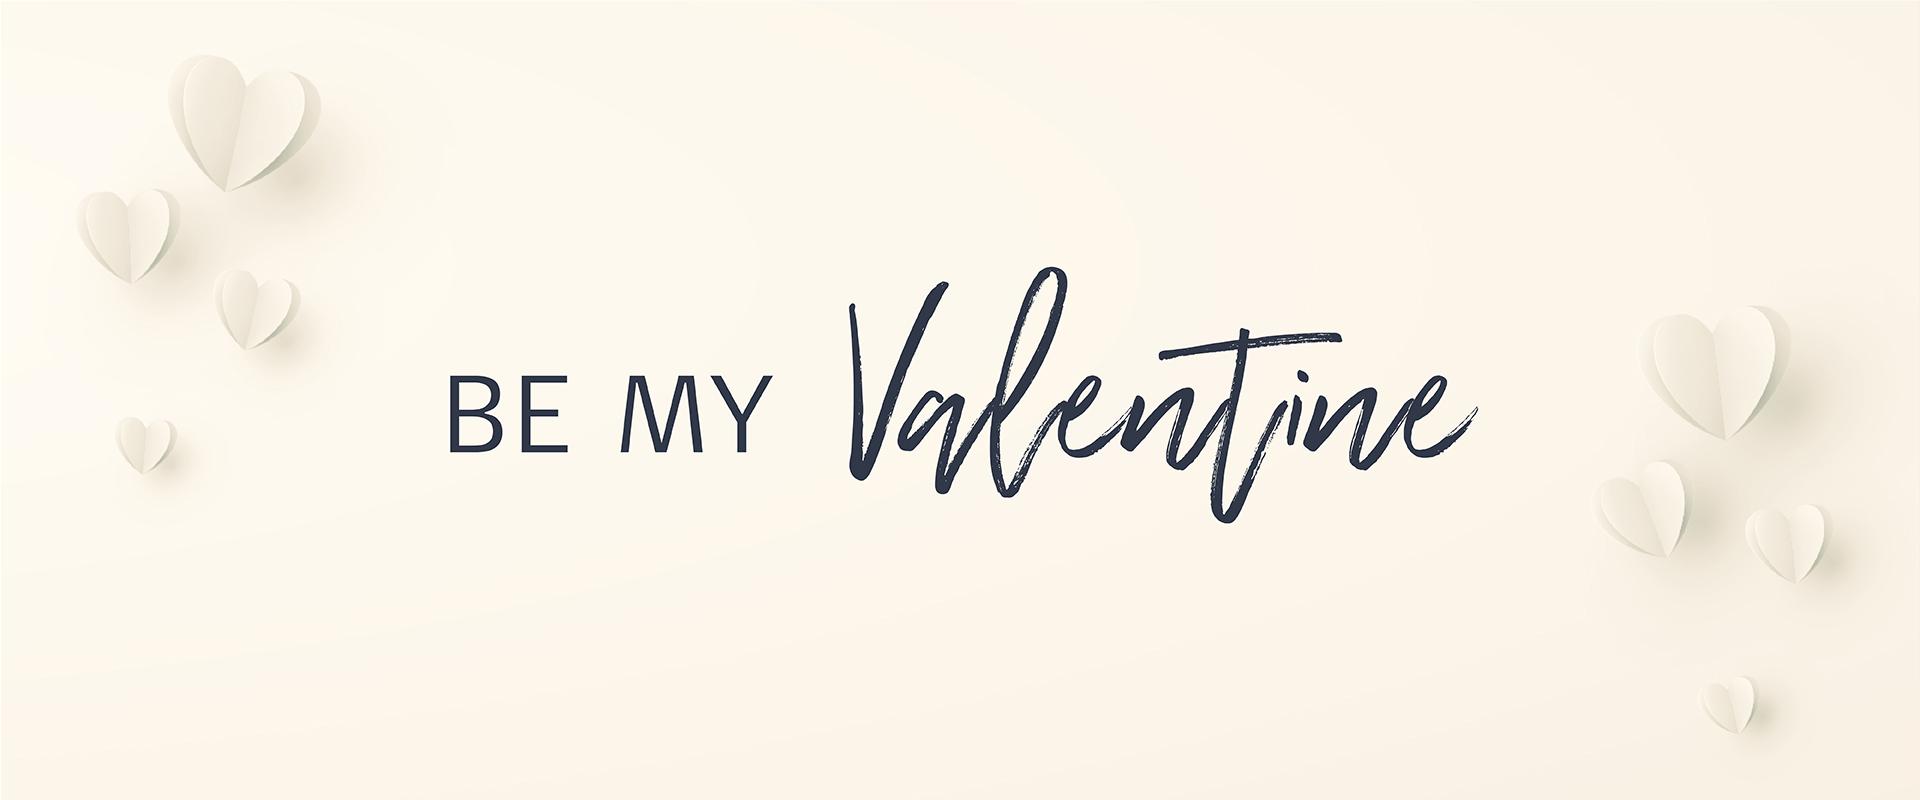 2020-01-15_BERING_Landingpage_Valentinesday2020__v1_01